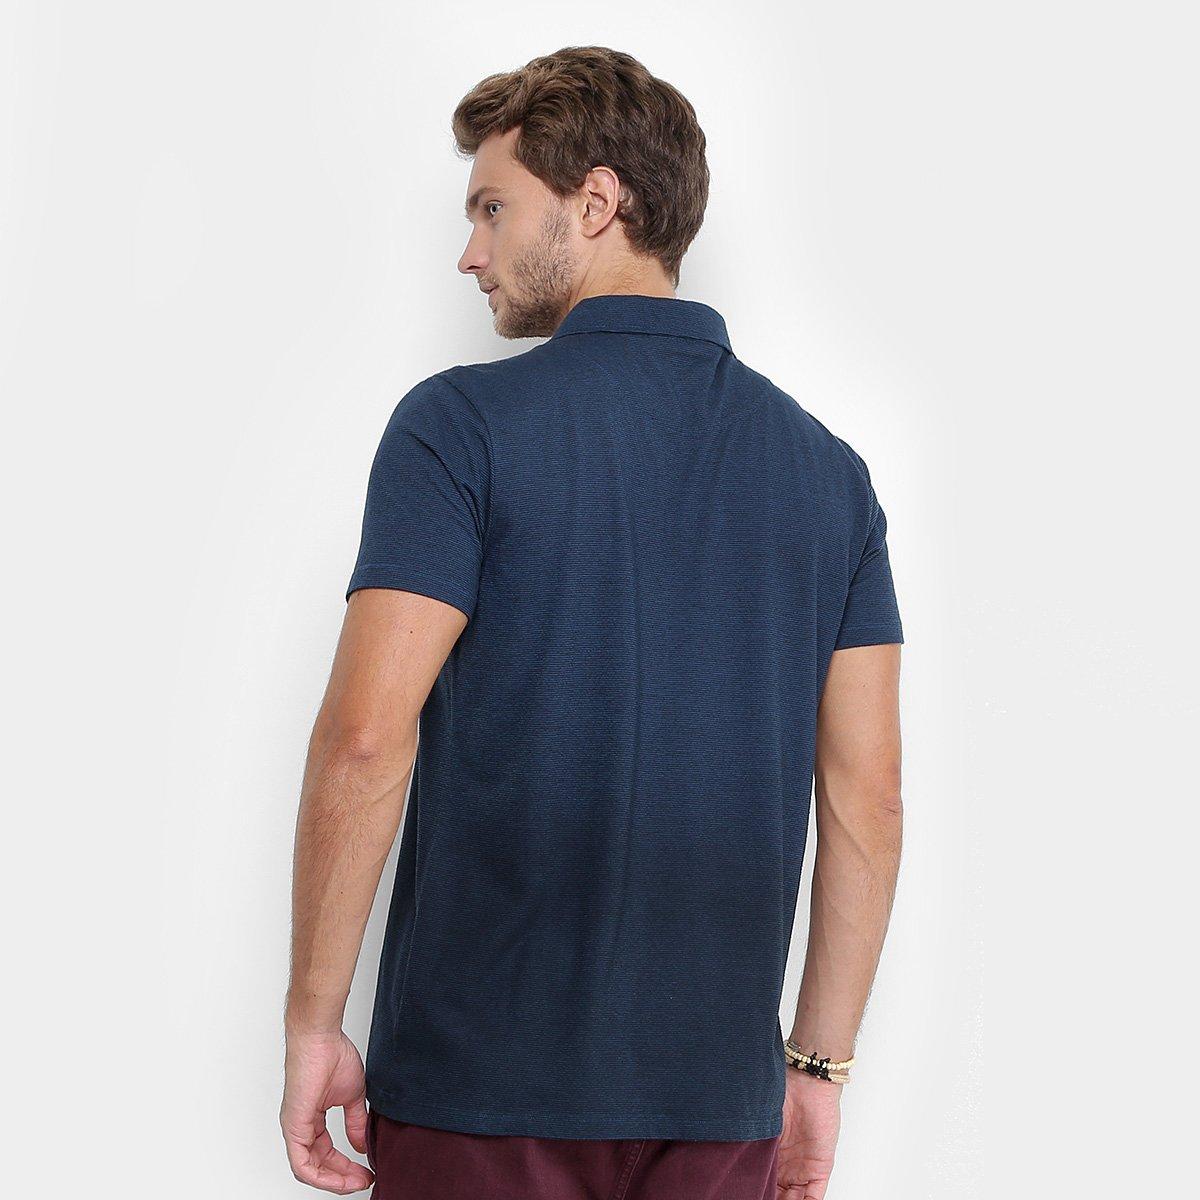 Camisa Polo Reserva Degradê Masculina  Camisa Polo Reserva Degradê Masculina  ... d53a9c359b1ed